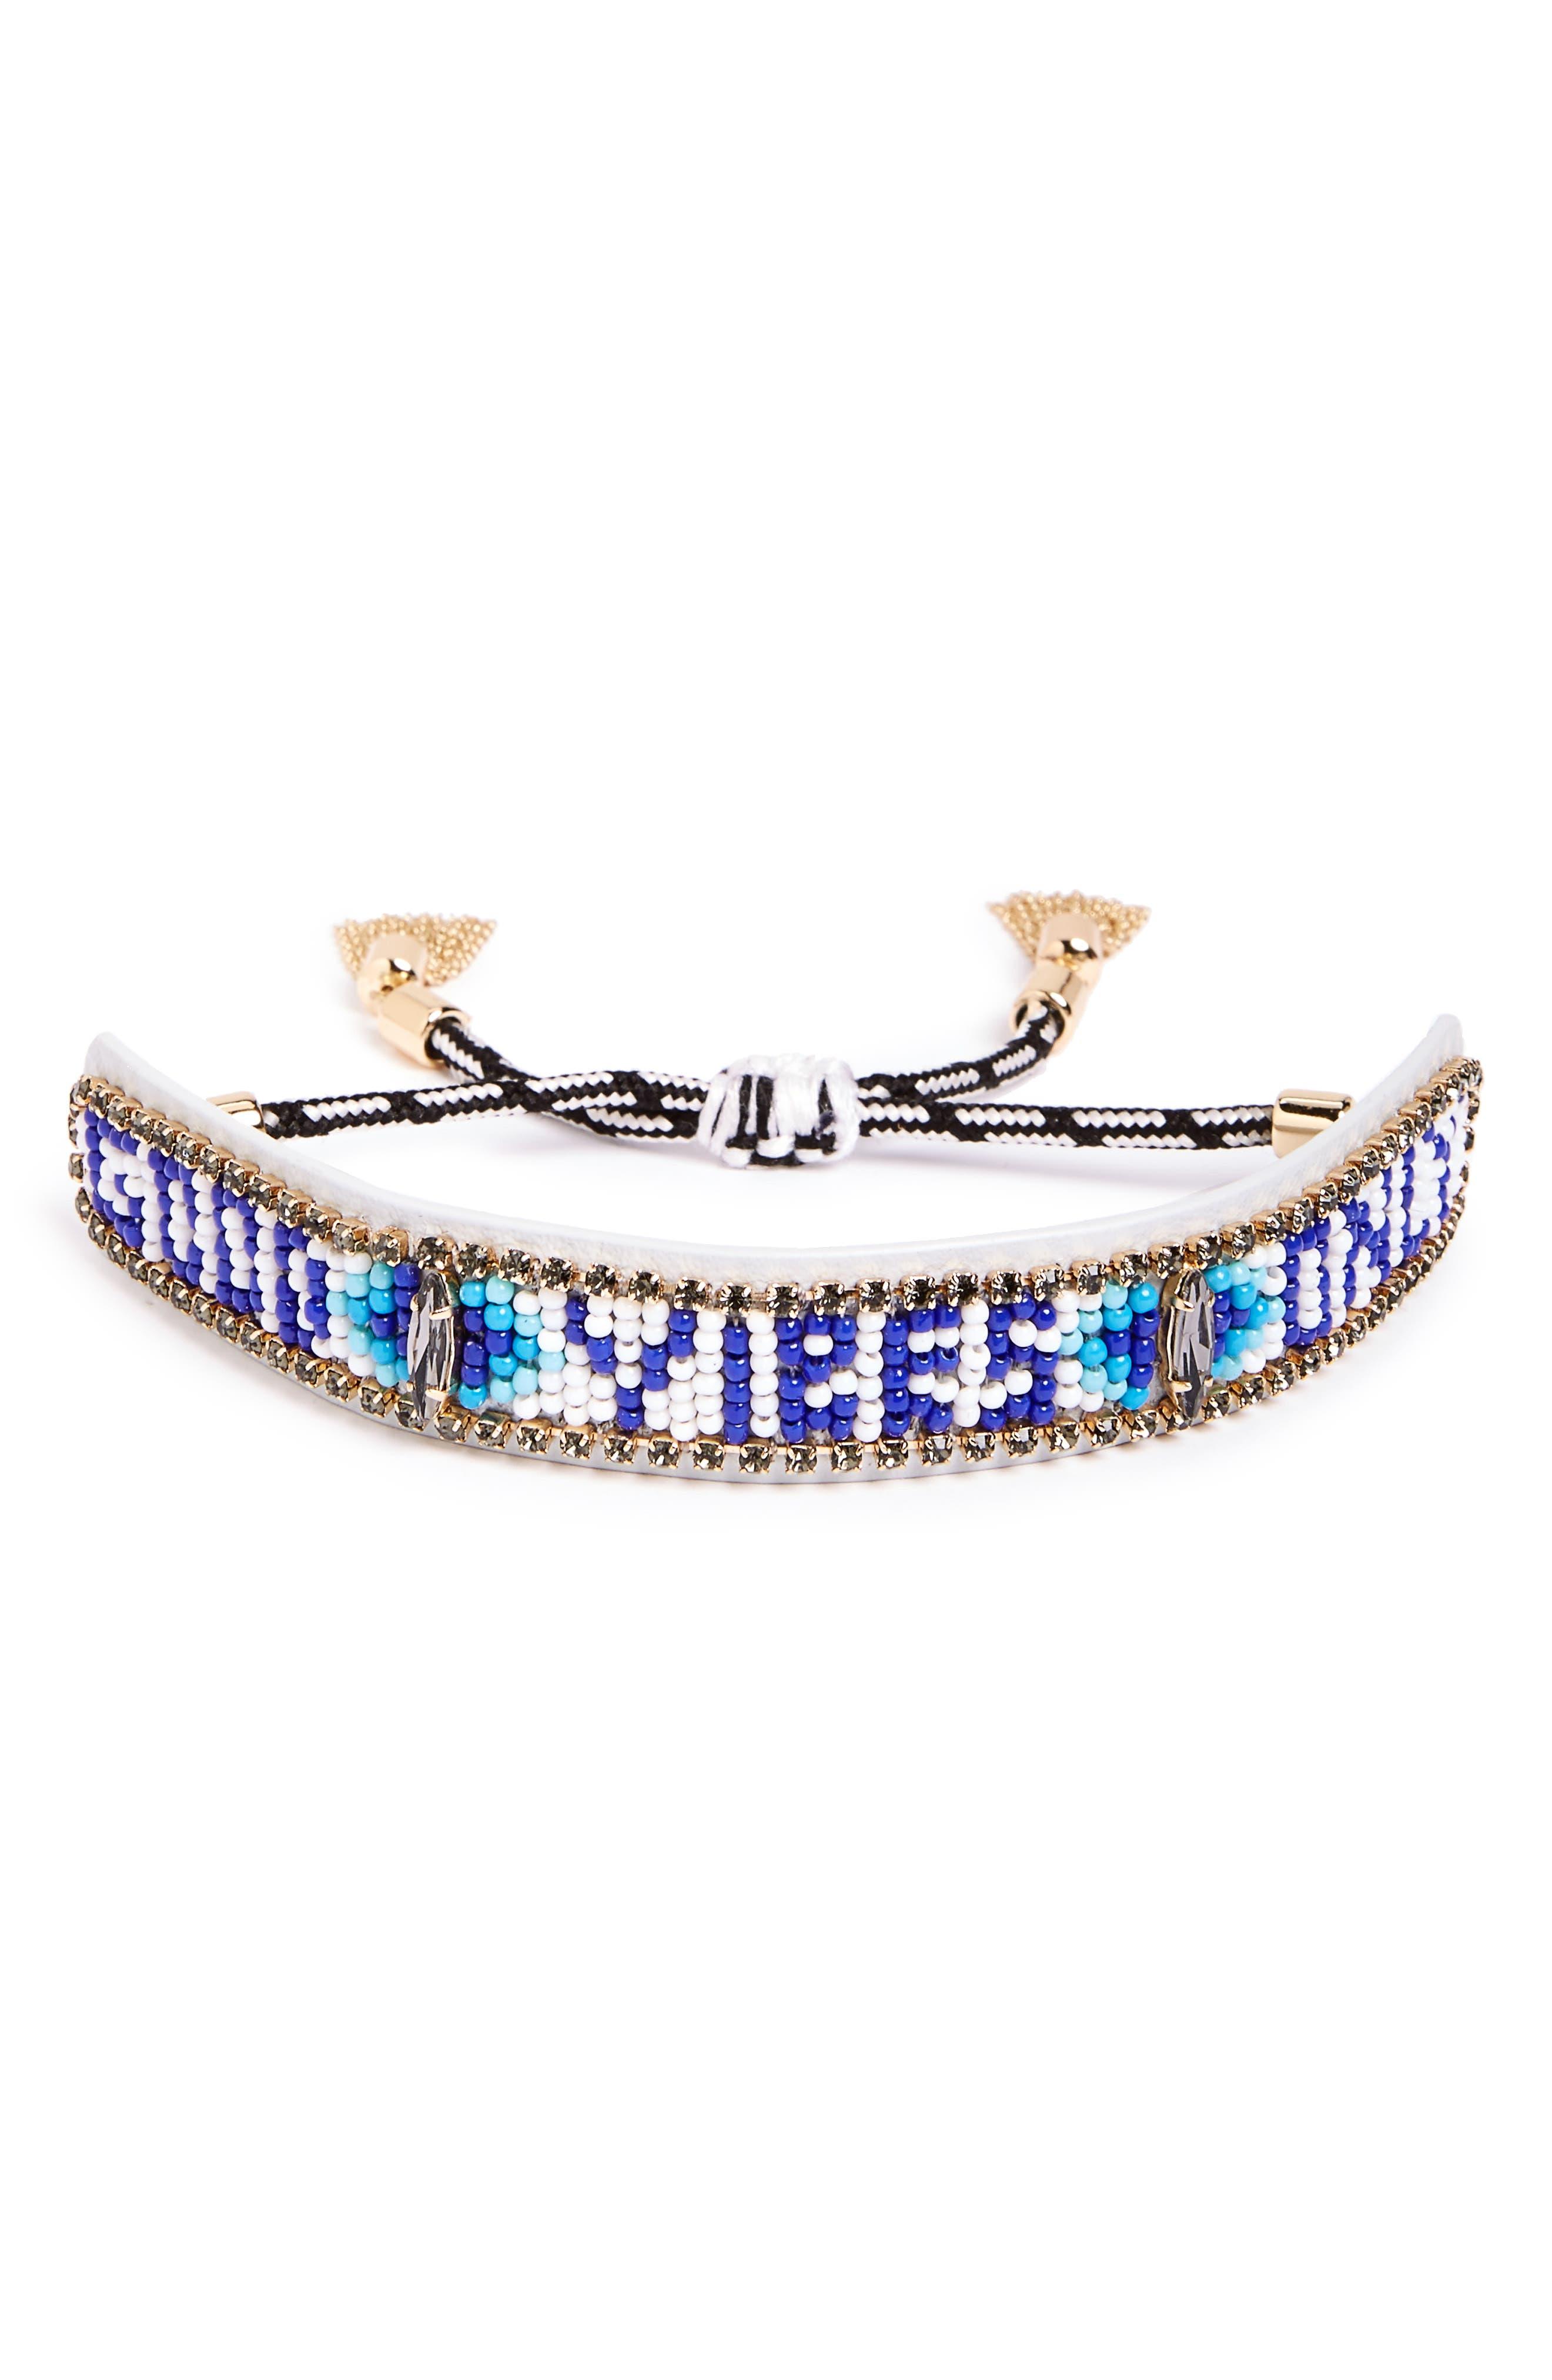 REBECCA MINKOFF Good Vibes Only Bead Bracelet